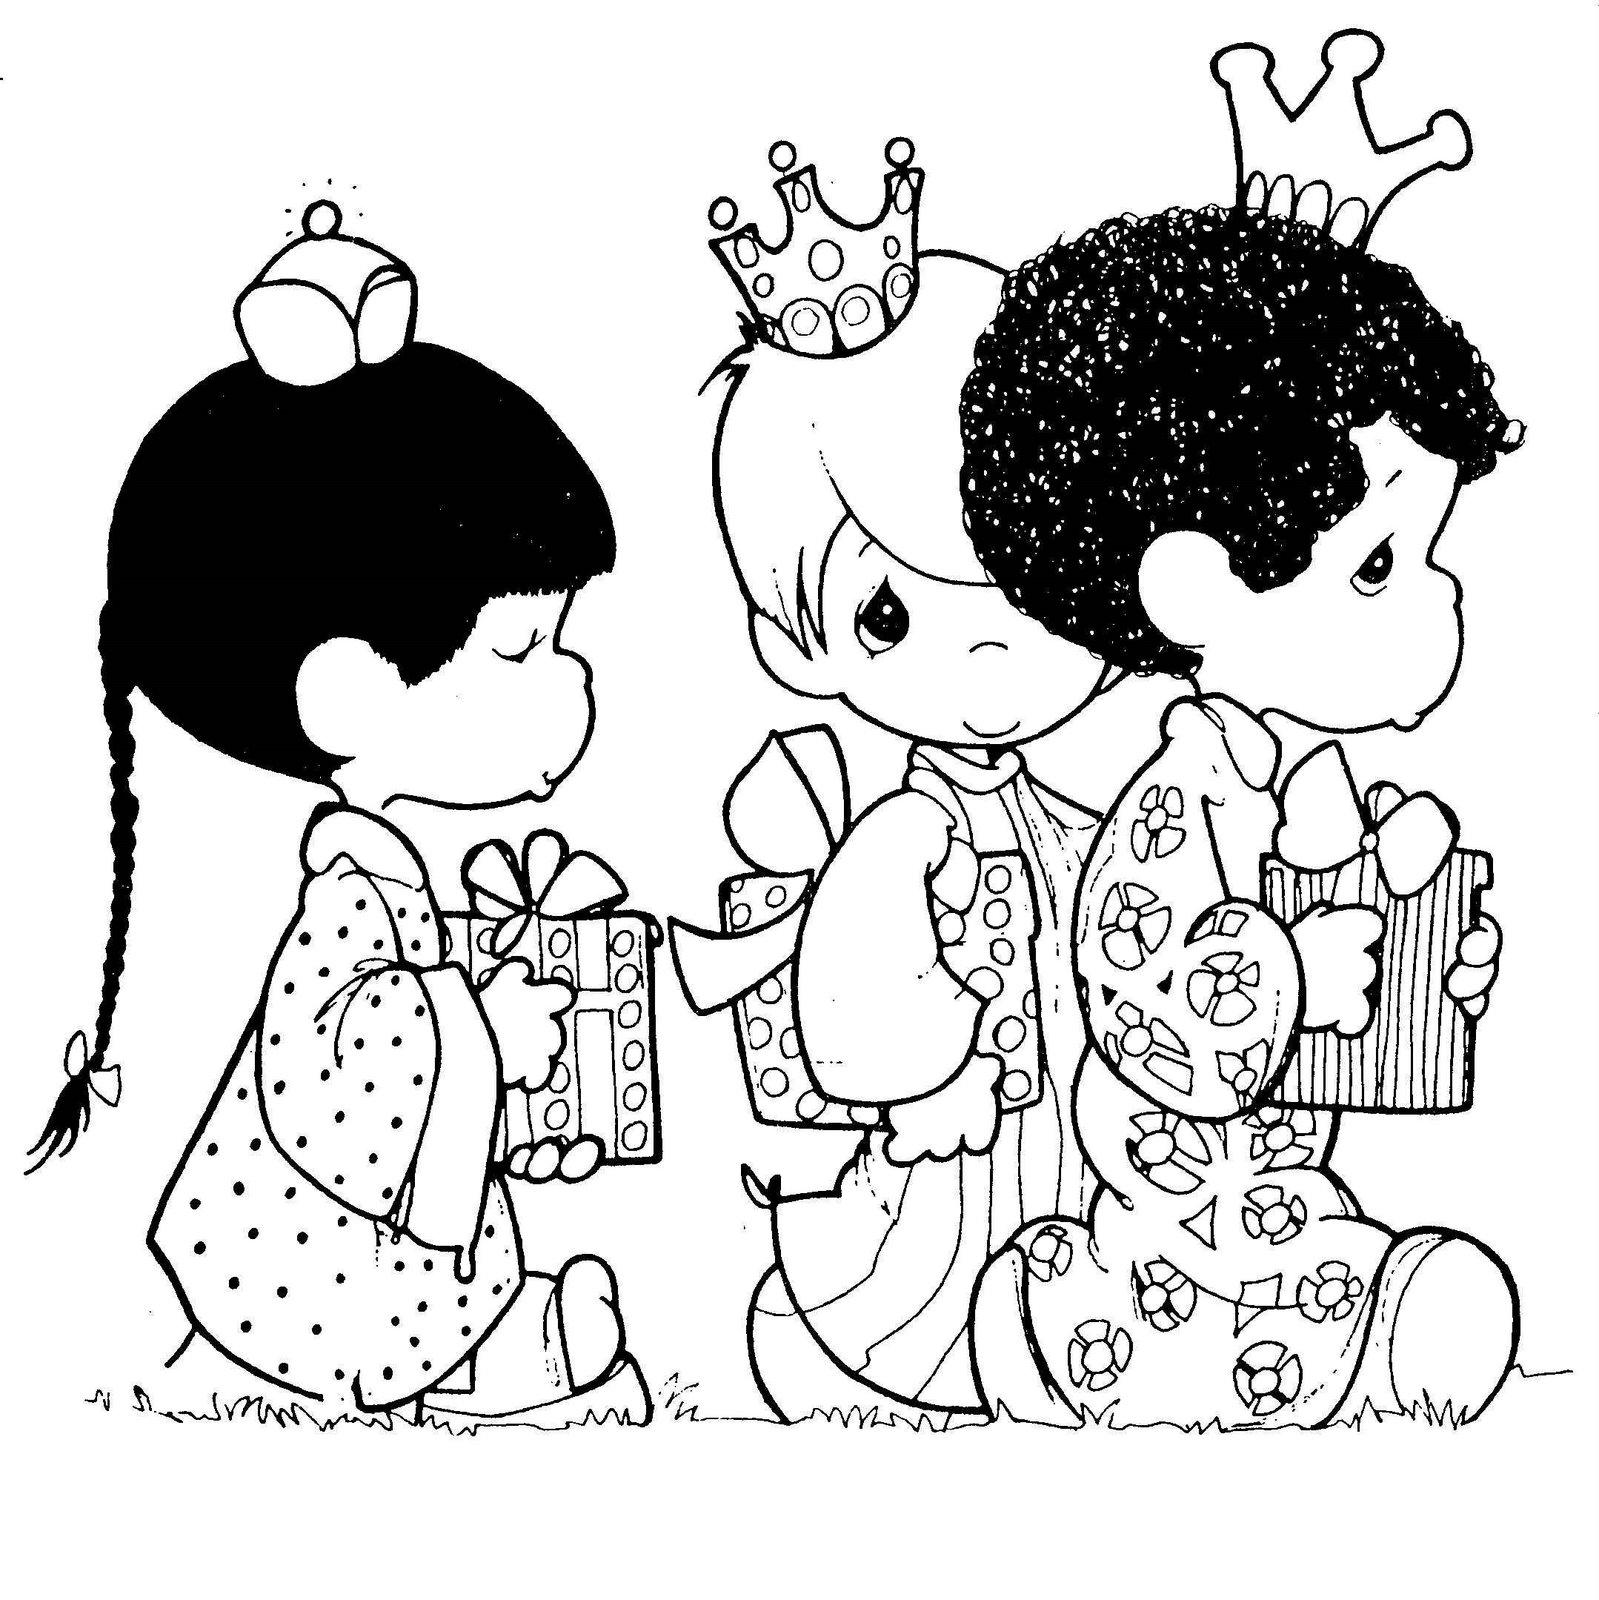 1599 x 1600 jpeg 363kB, Dibujo De Los Reyes Magos   New Calendar ...